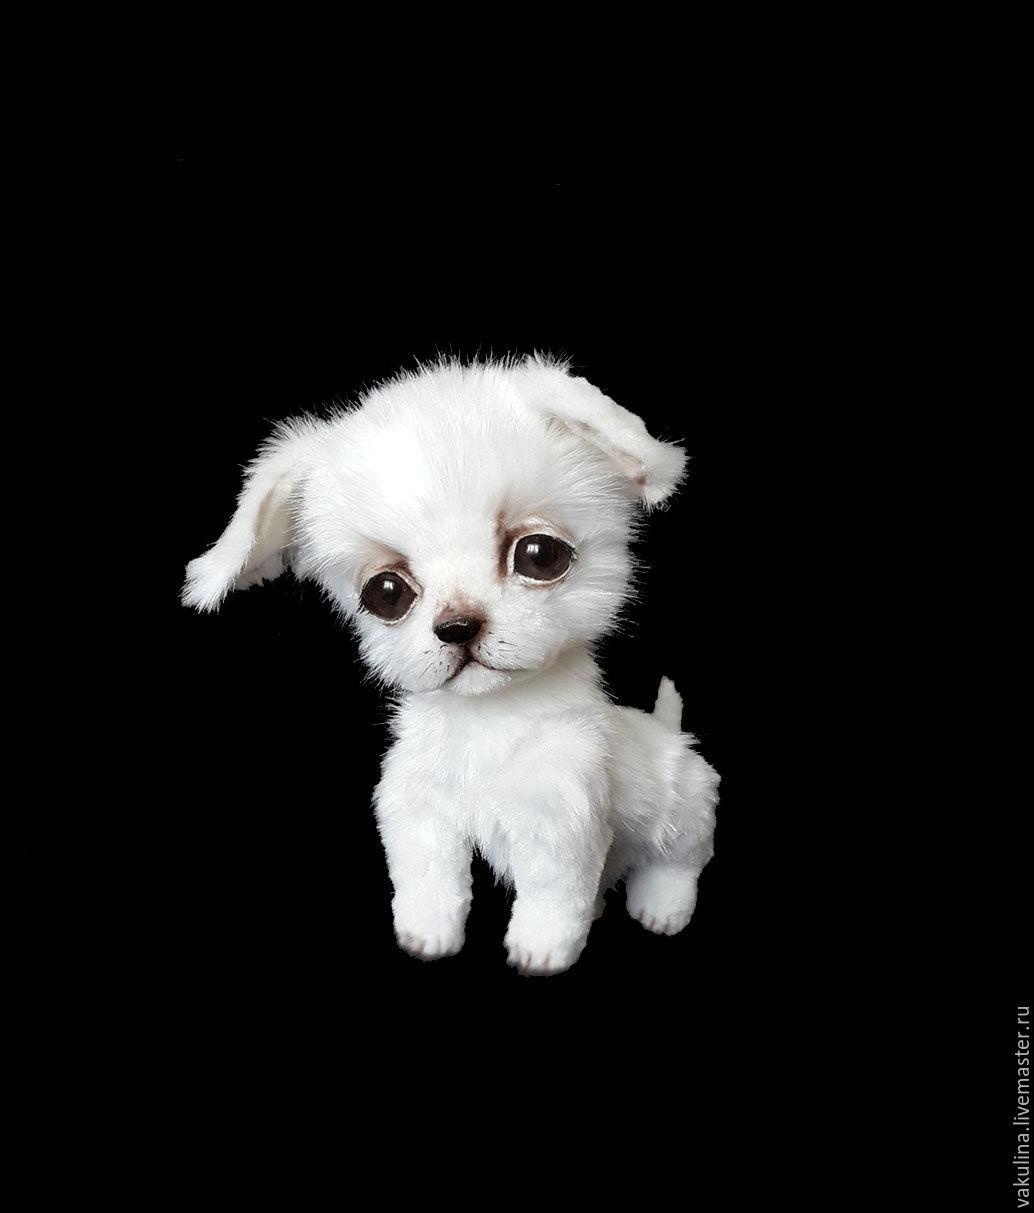 Daftar Harga Handmade Wolf Maltese Termurah 2018 Loop Casio Europe Mq 71 1b Jam Tangan Pria Black Strap Resin Chihuahua Puppy Cupcake Shop Online On Livemaster With Shipping Teddy Bears Order Vakulina